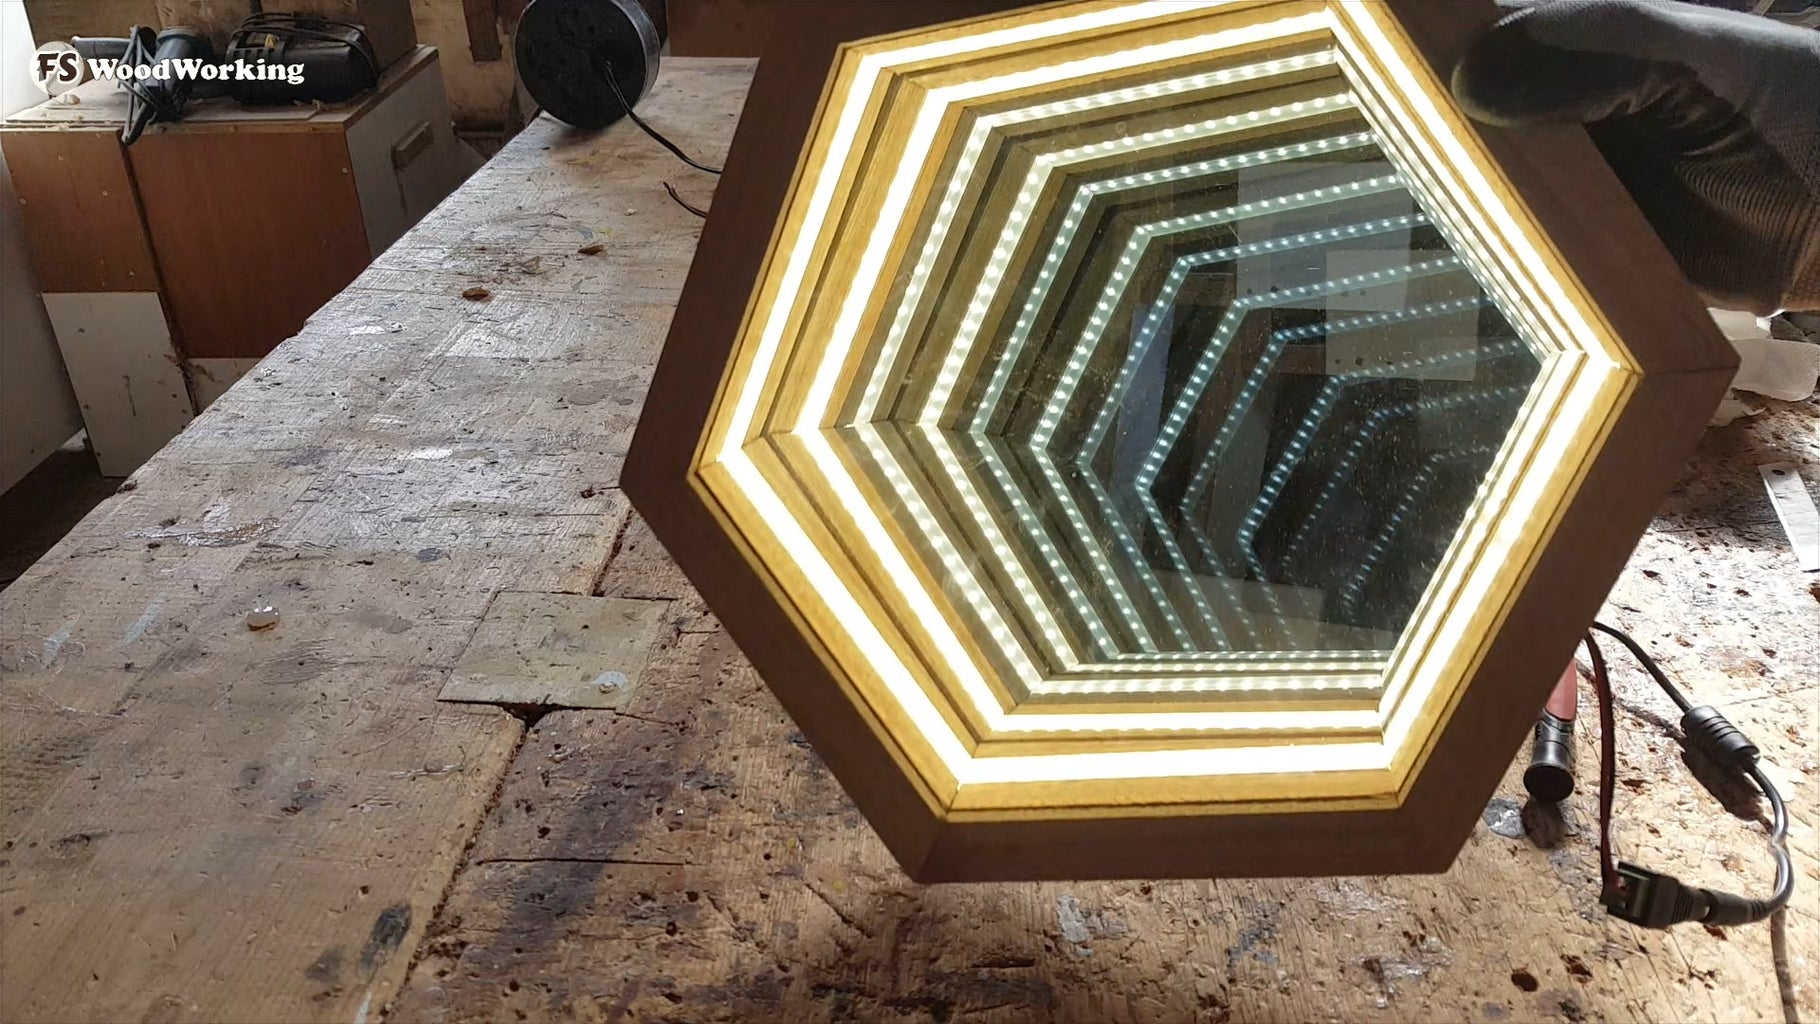 The LED Strip